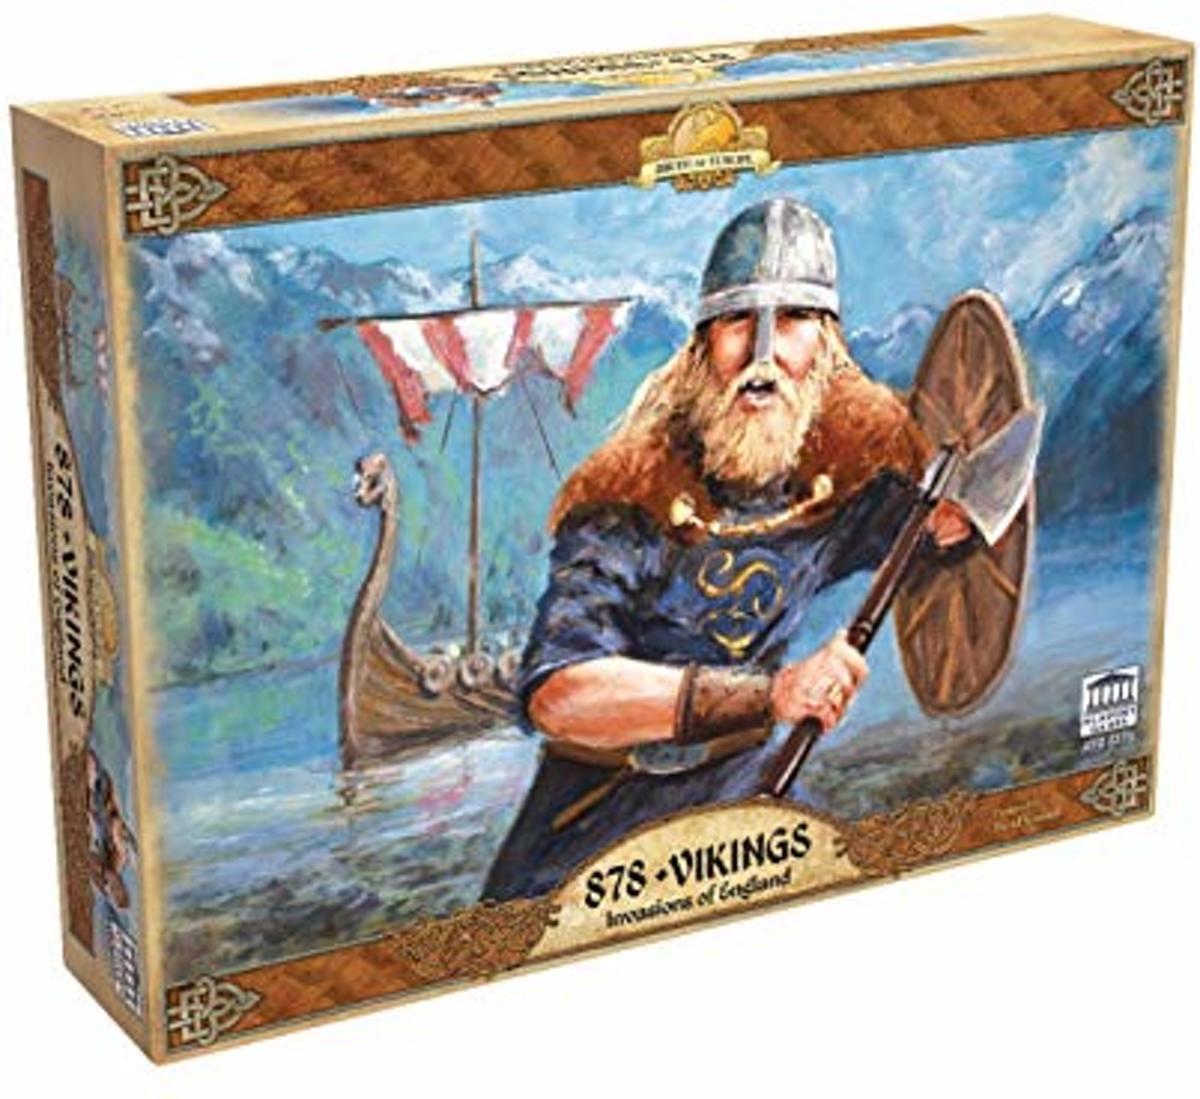 878 Vikings boardgame